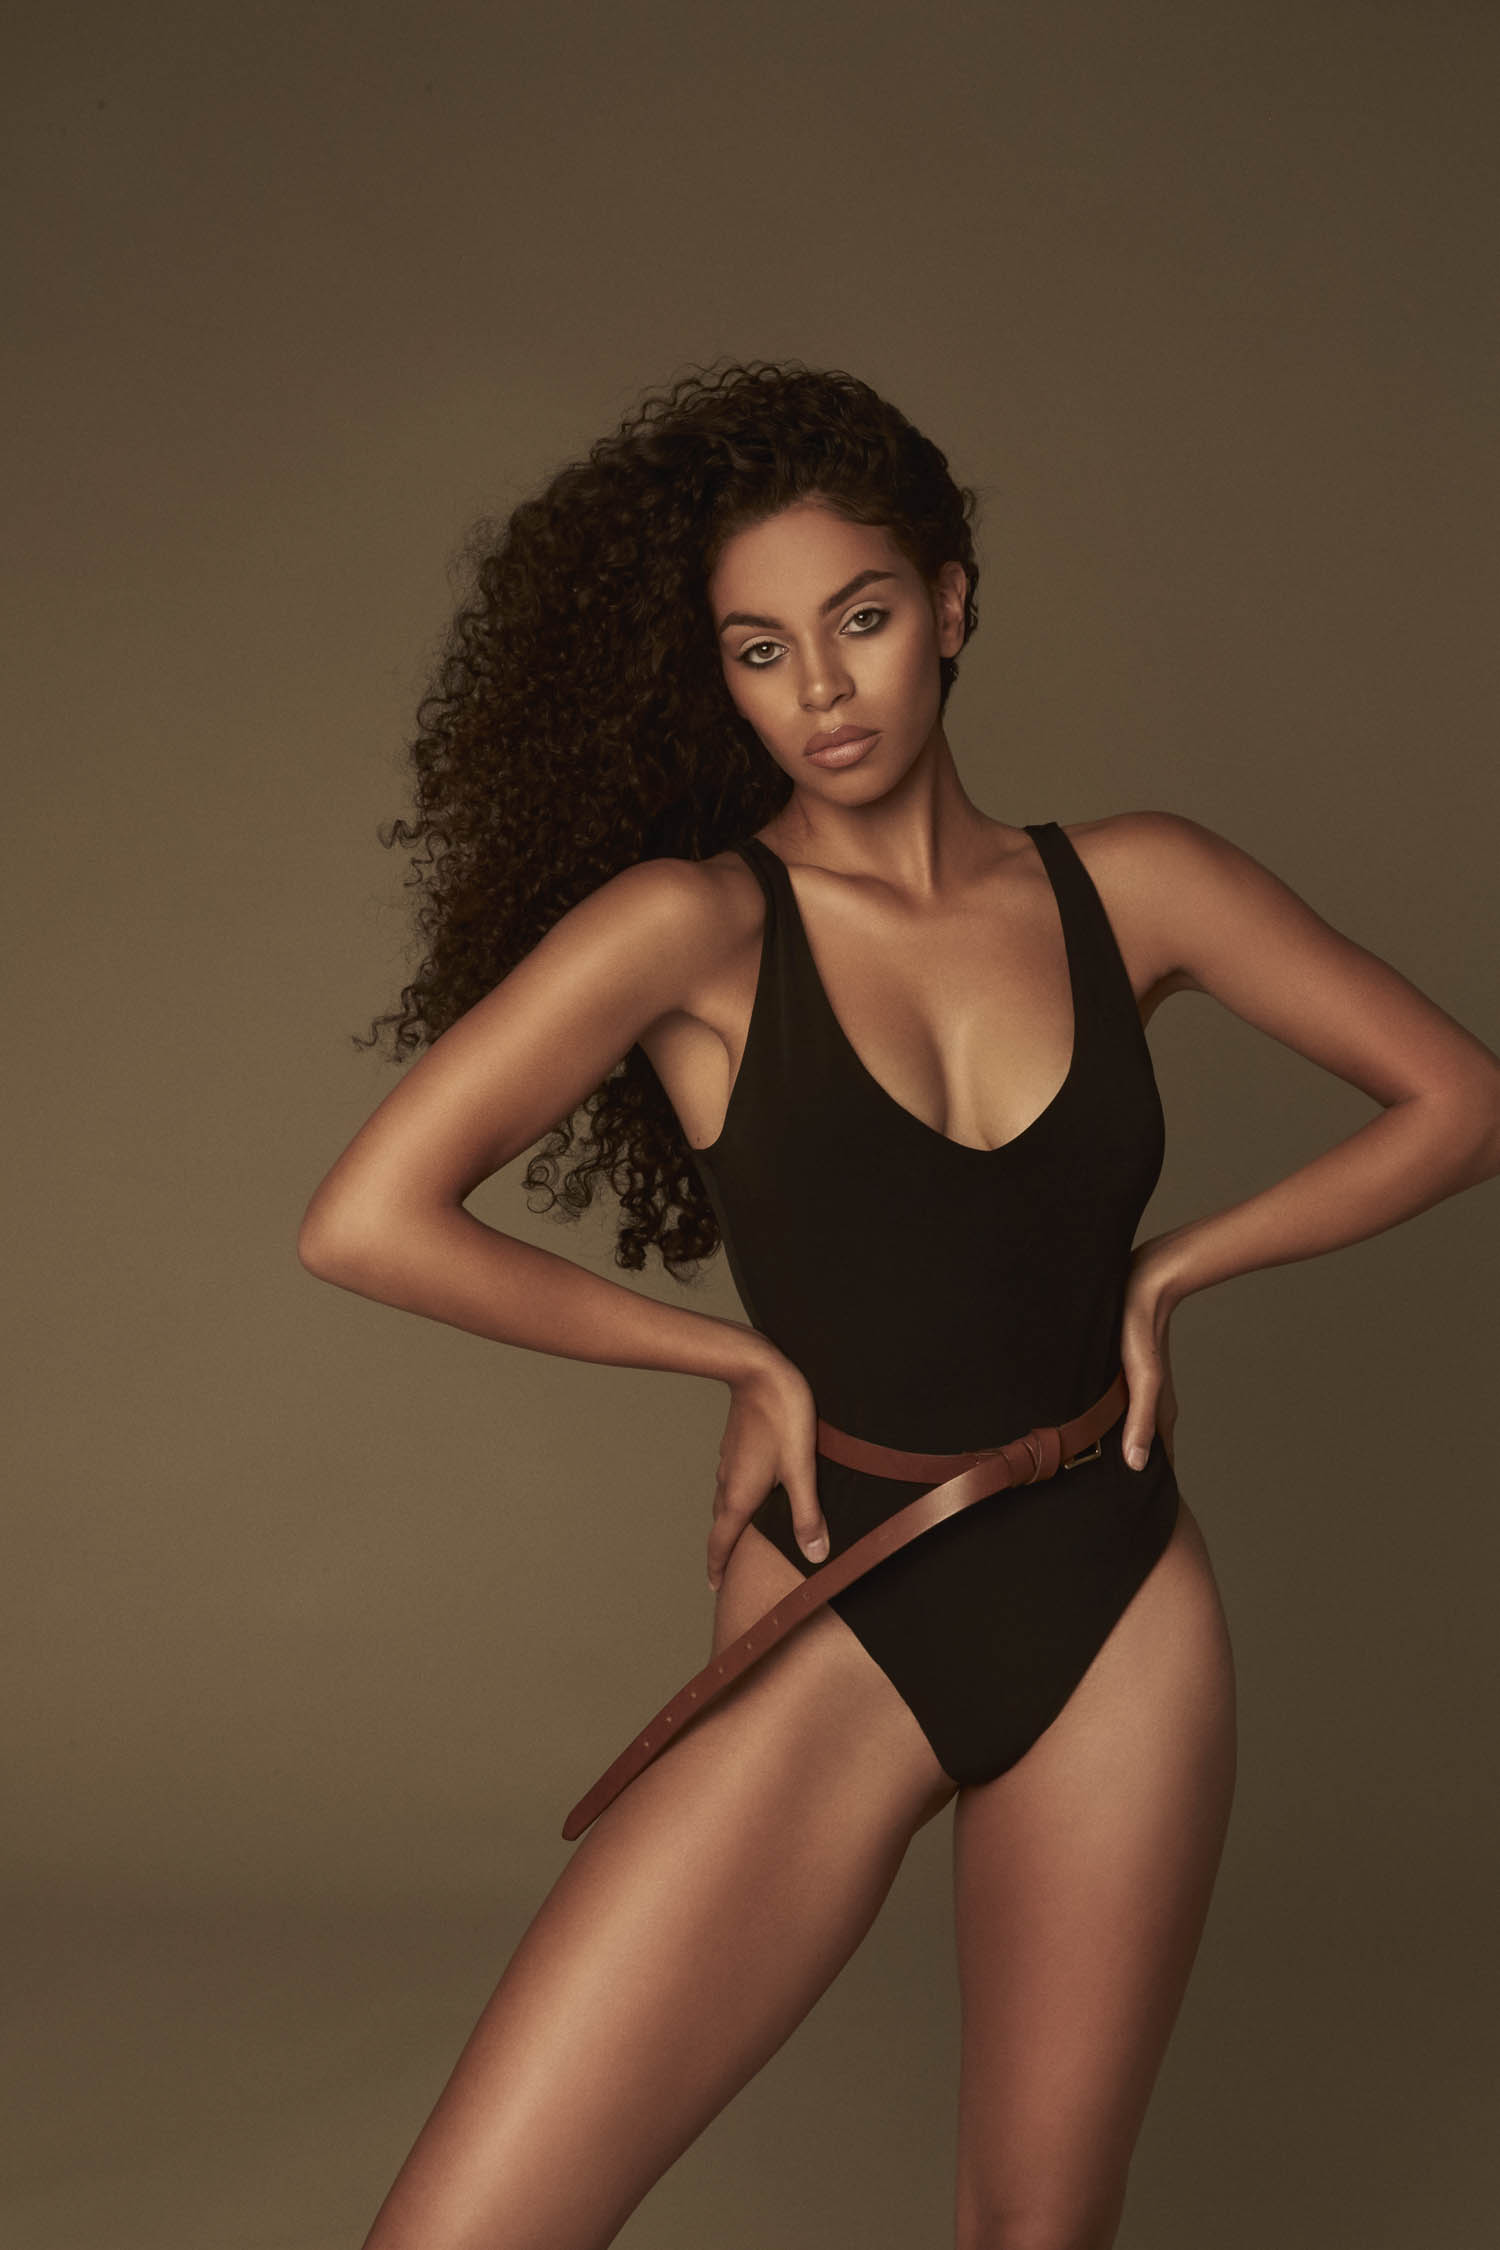 Model in bodysuit for portfolio session